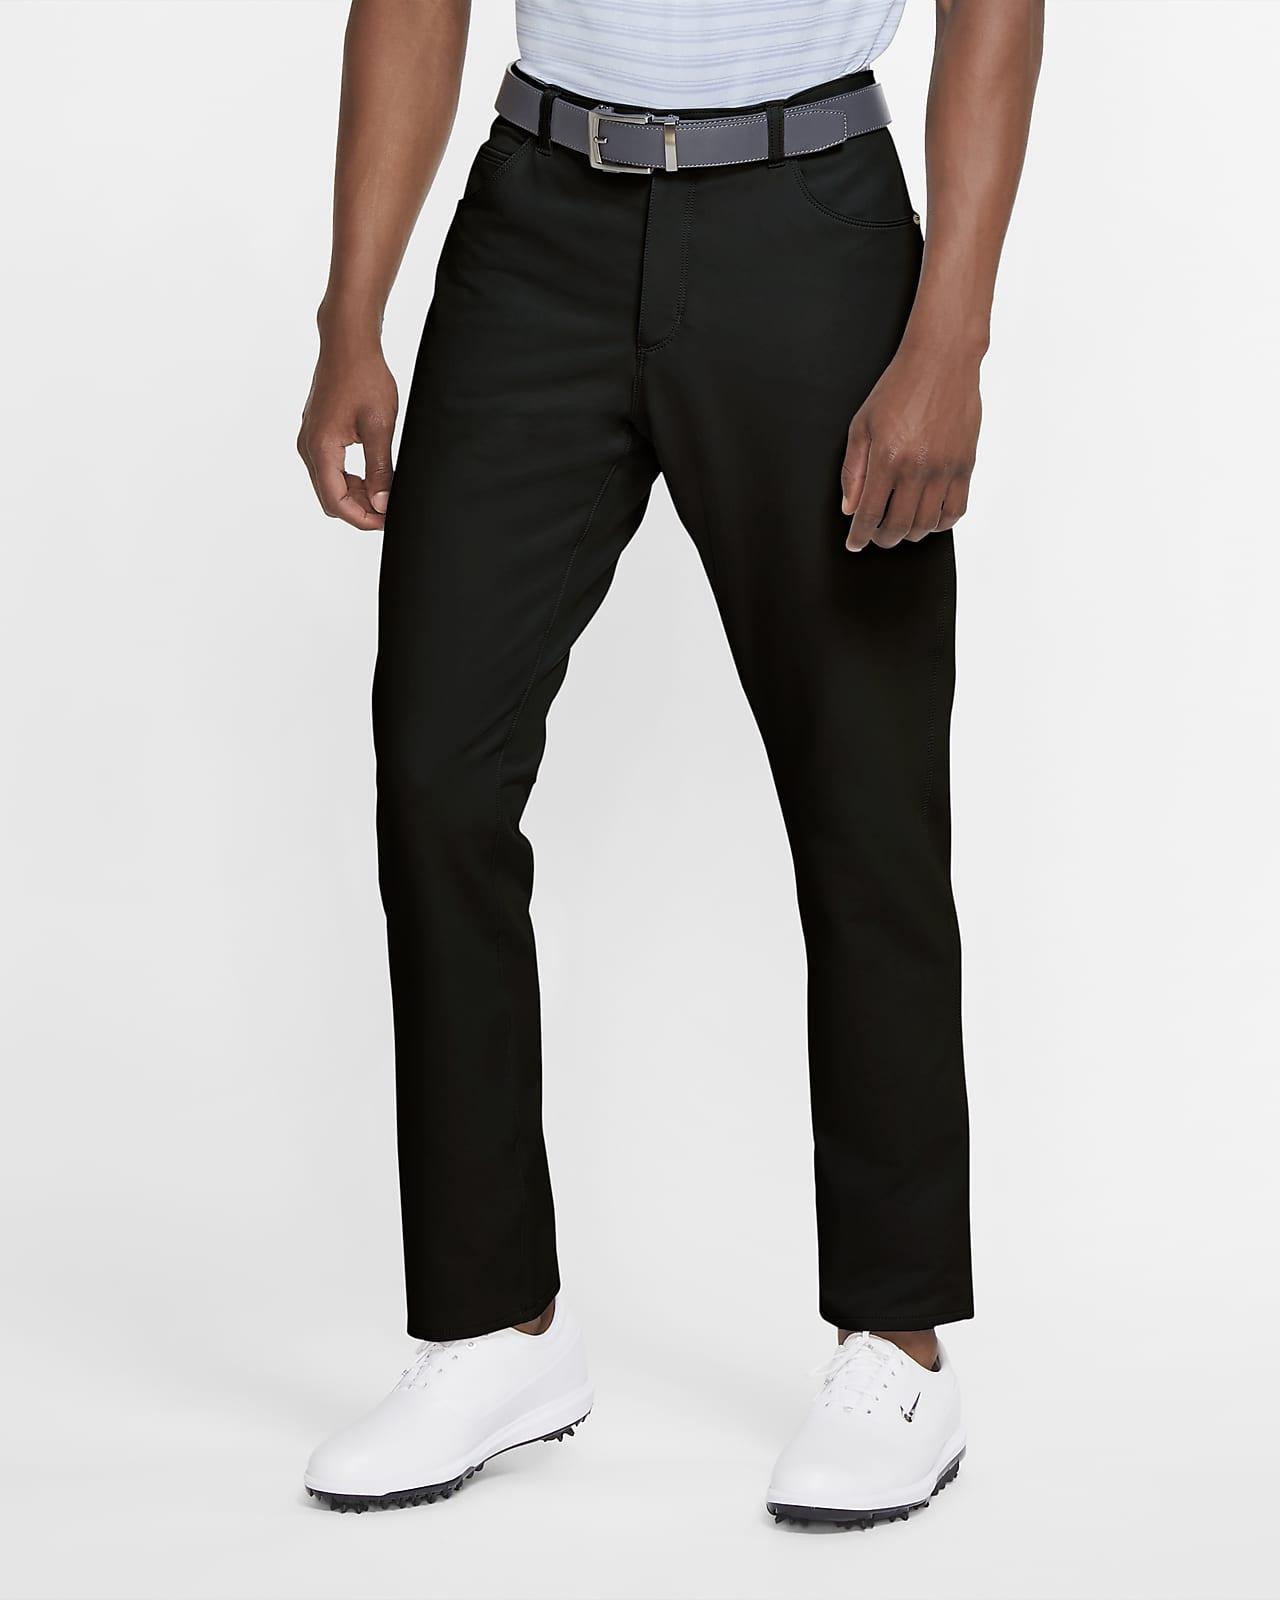 Nike Flex Repel Men's Slim Fit Golf Pants